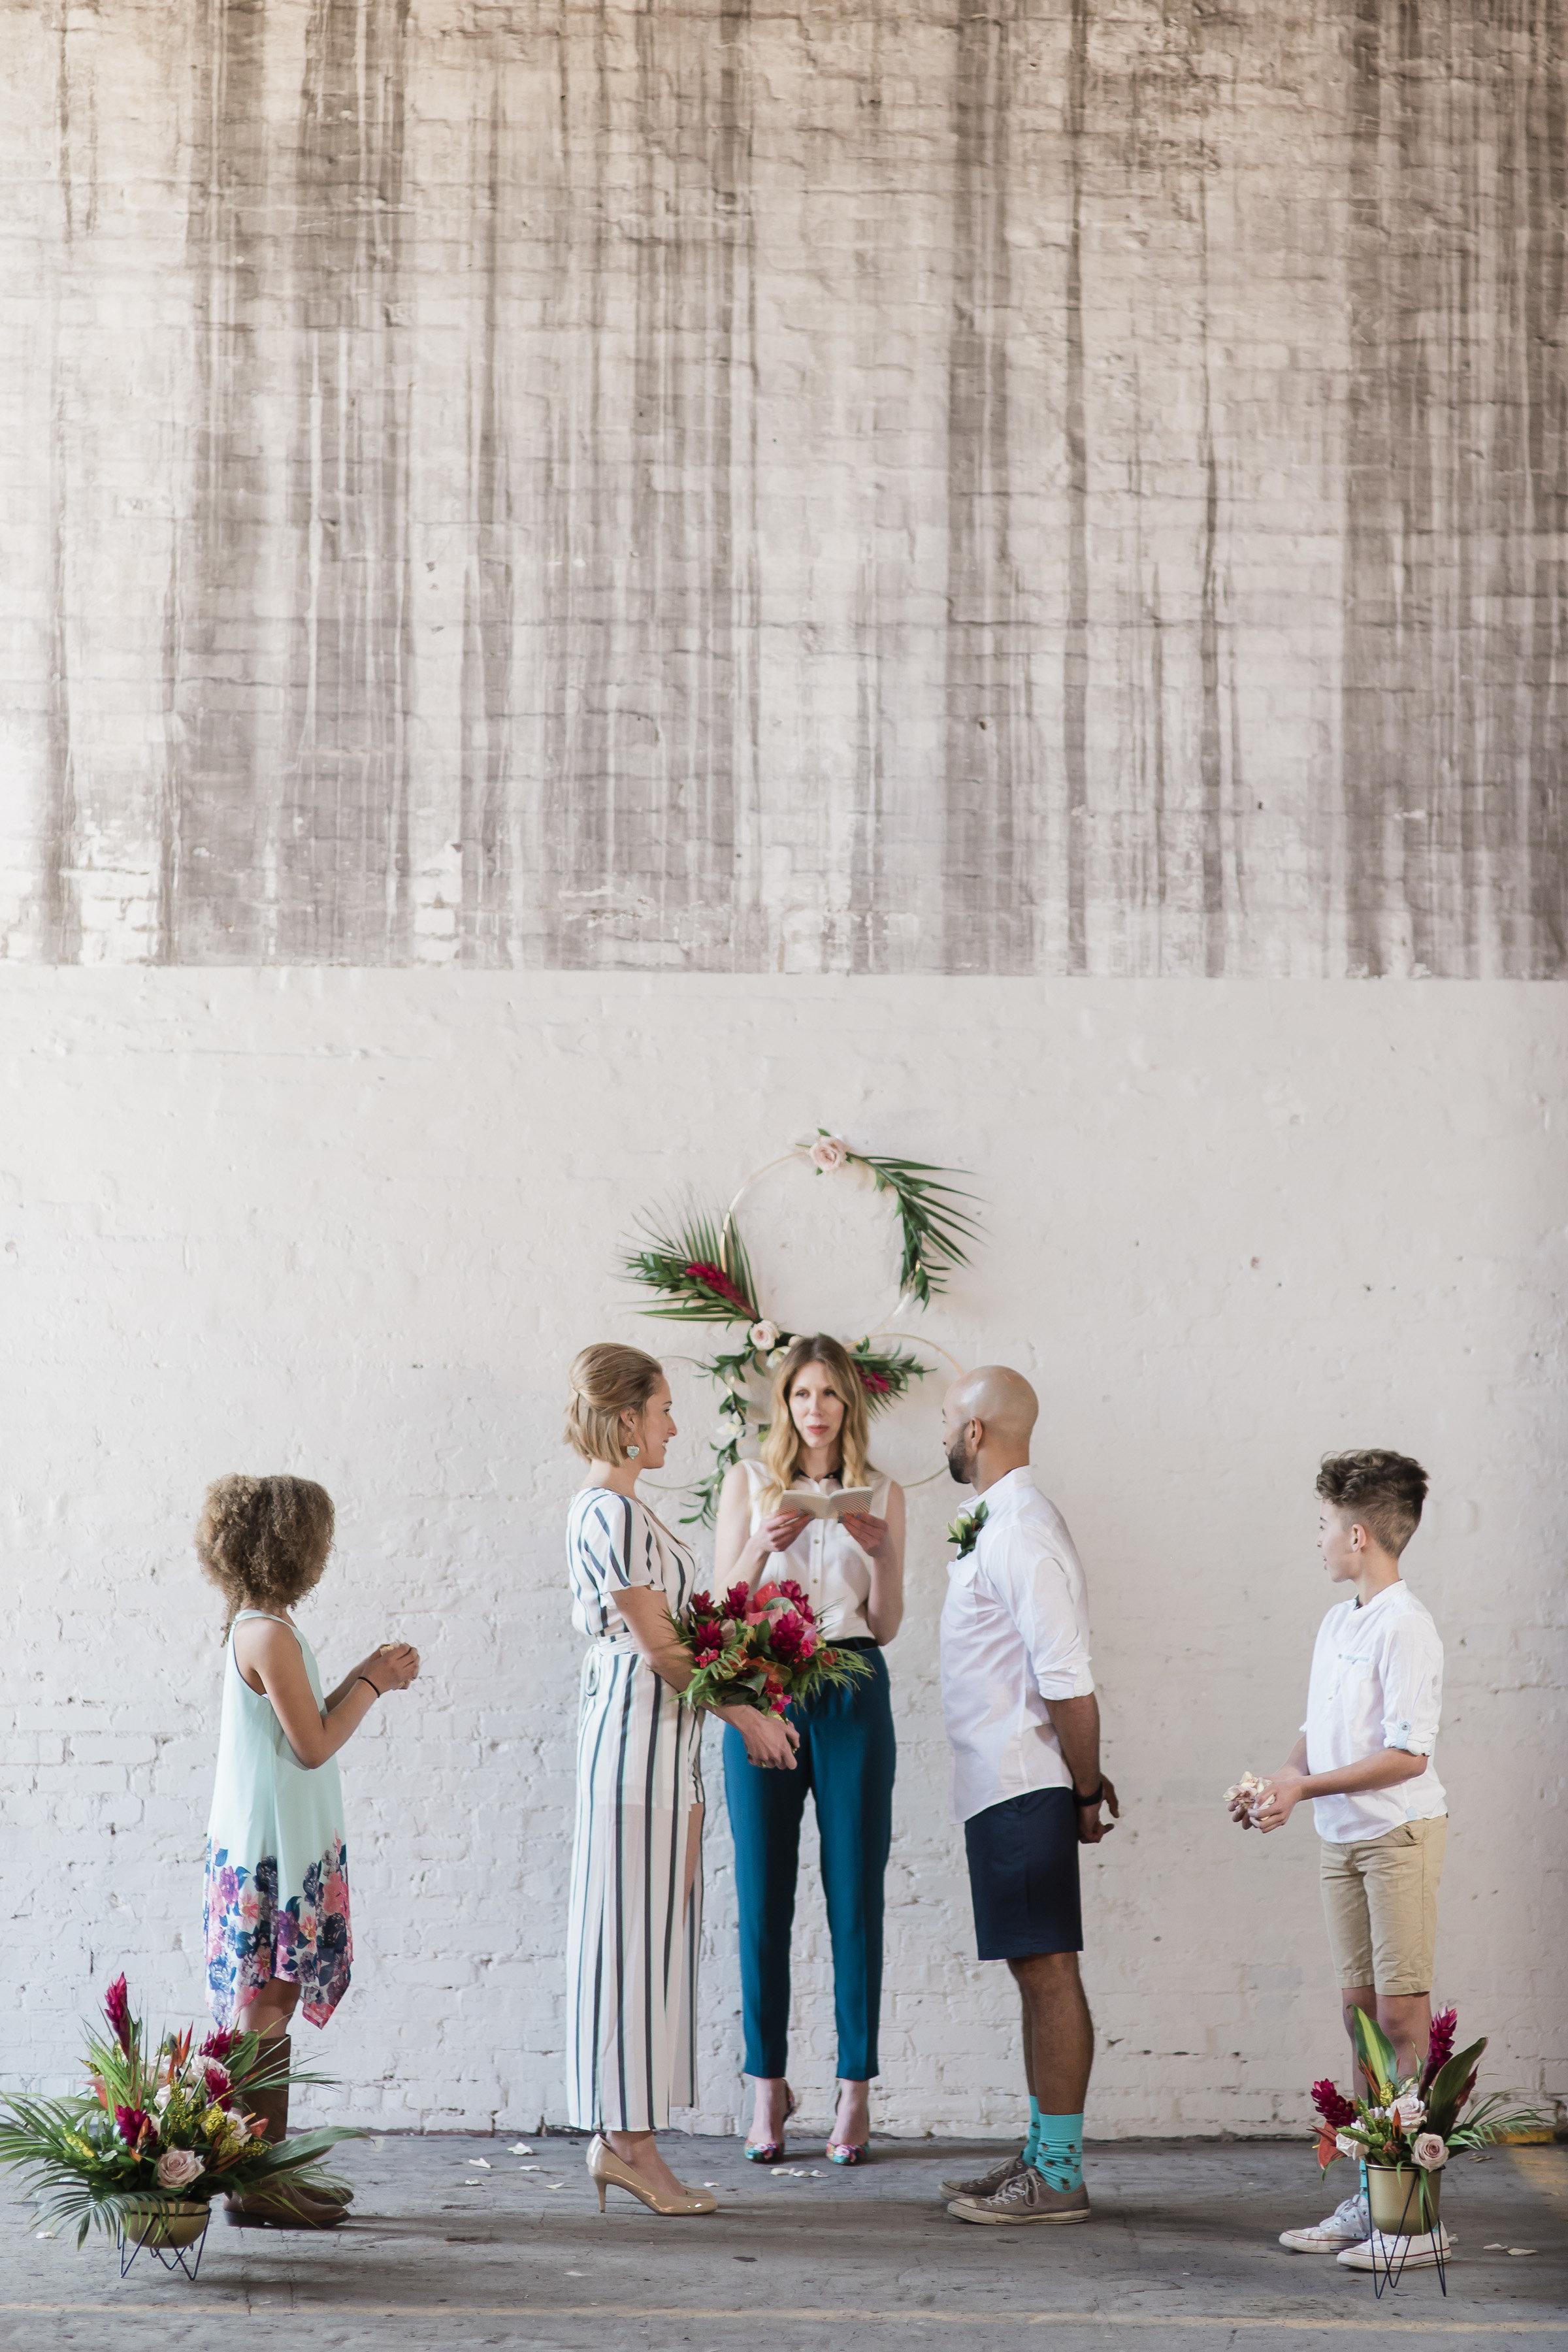 Sara Elizabeth Weddings Pop Up